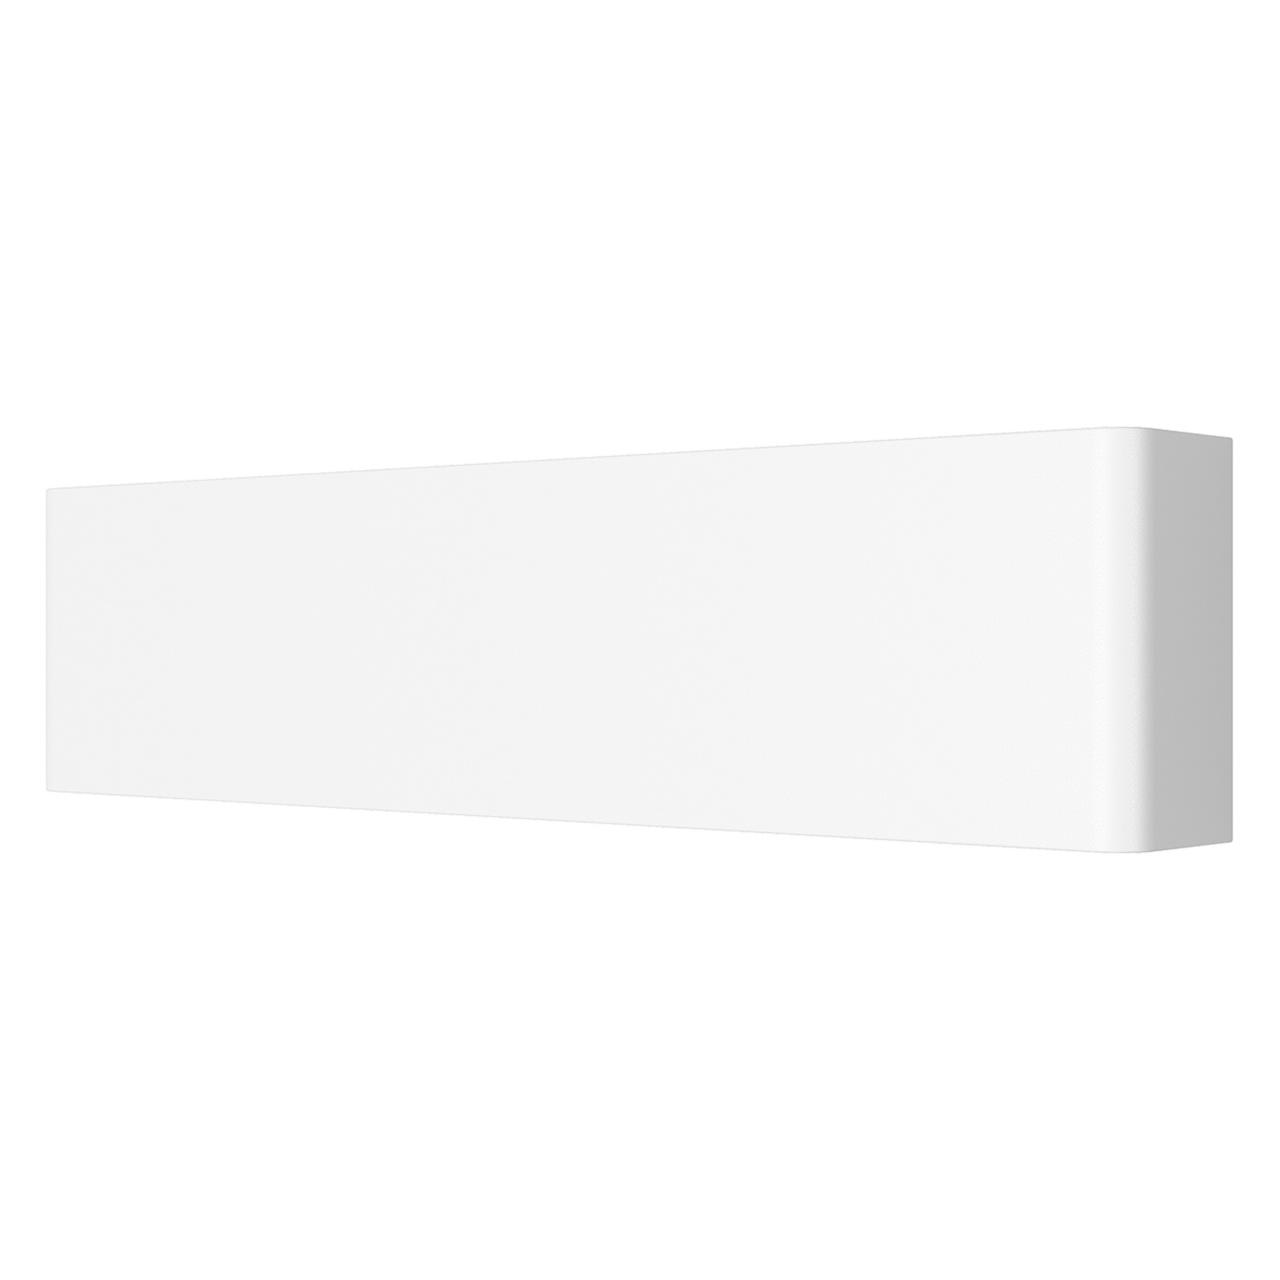 Бра Fiume 10W 950LM матовый белый 4000K Lightstar 810616